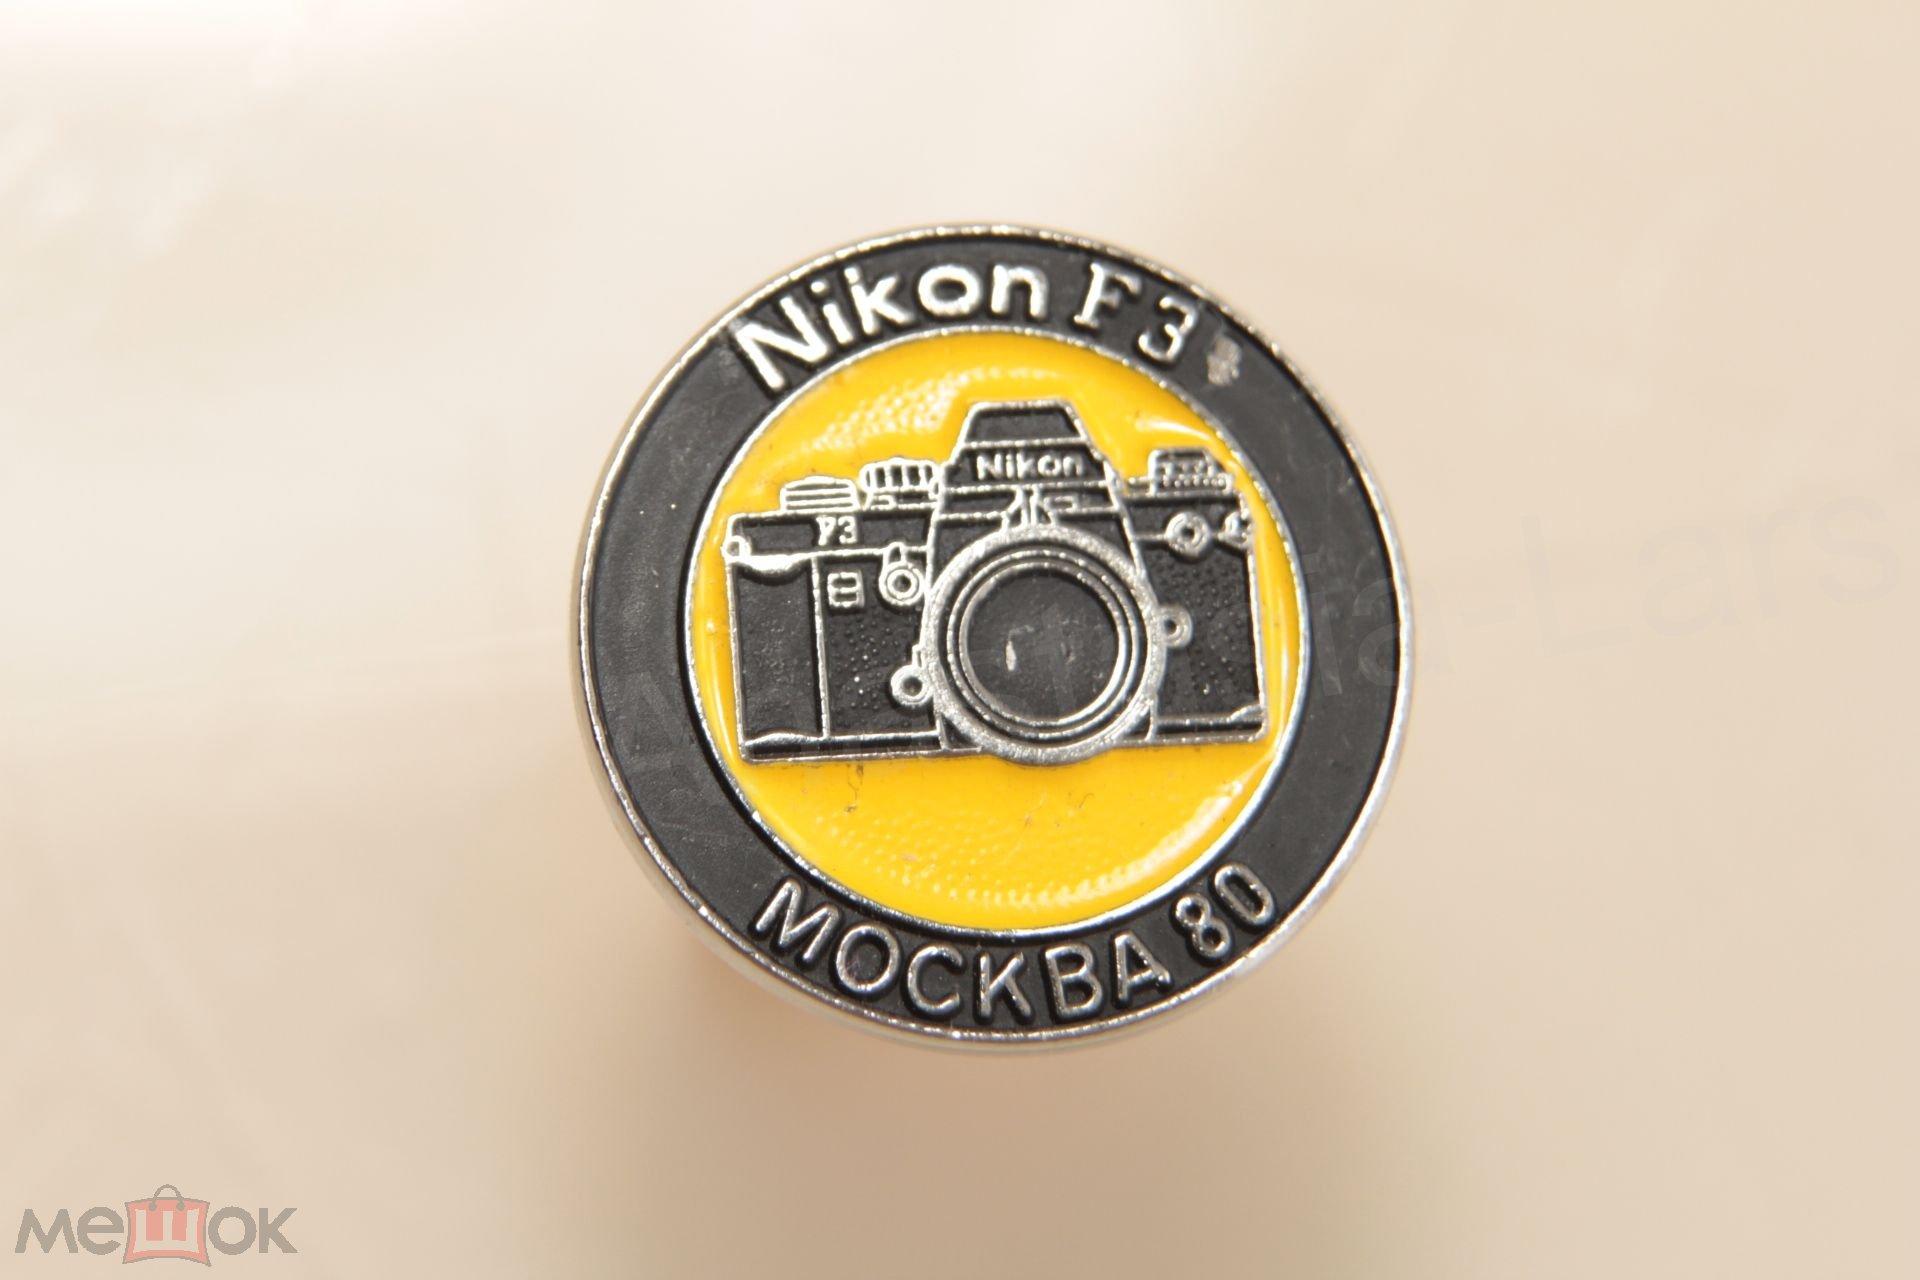 Nikon F3 pin (Pic: Meshok)